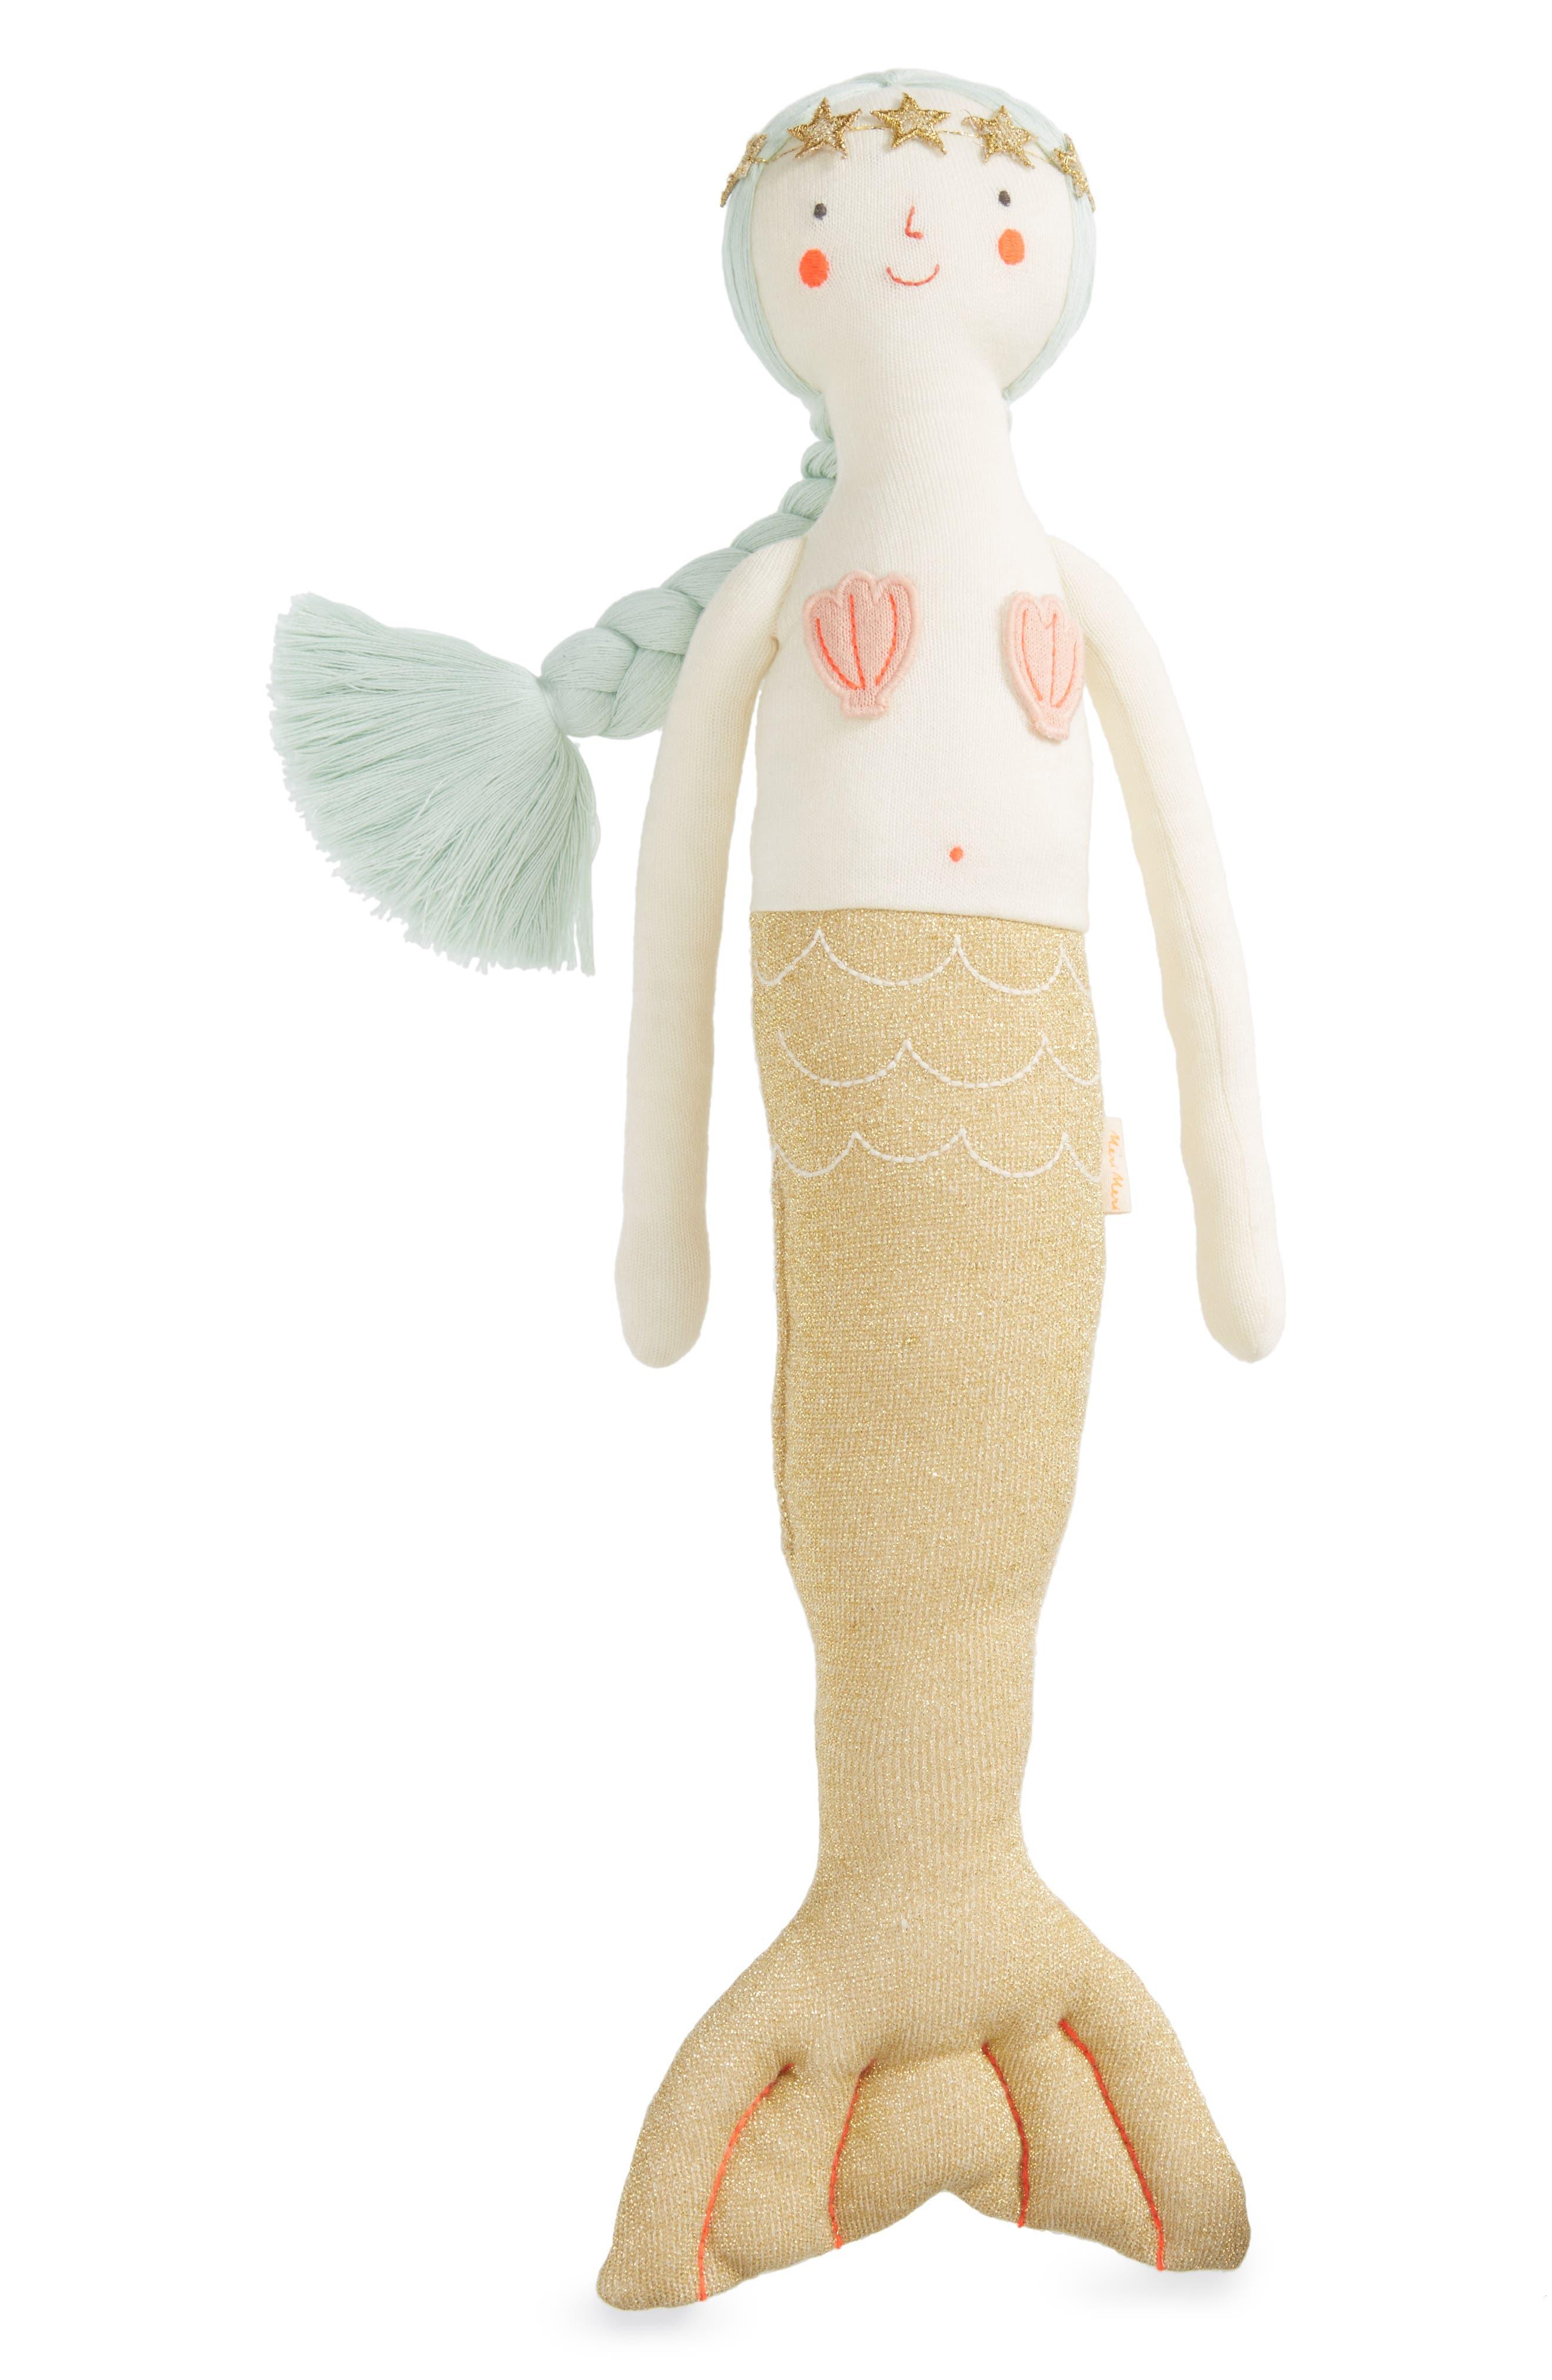 Meri Meri Knit Organic Cotton Mermaid Cushion/Toy